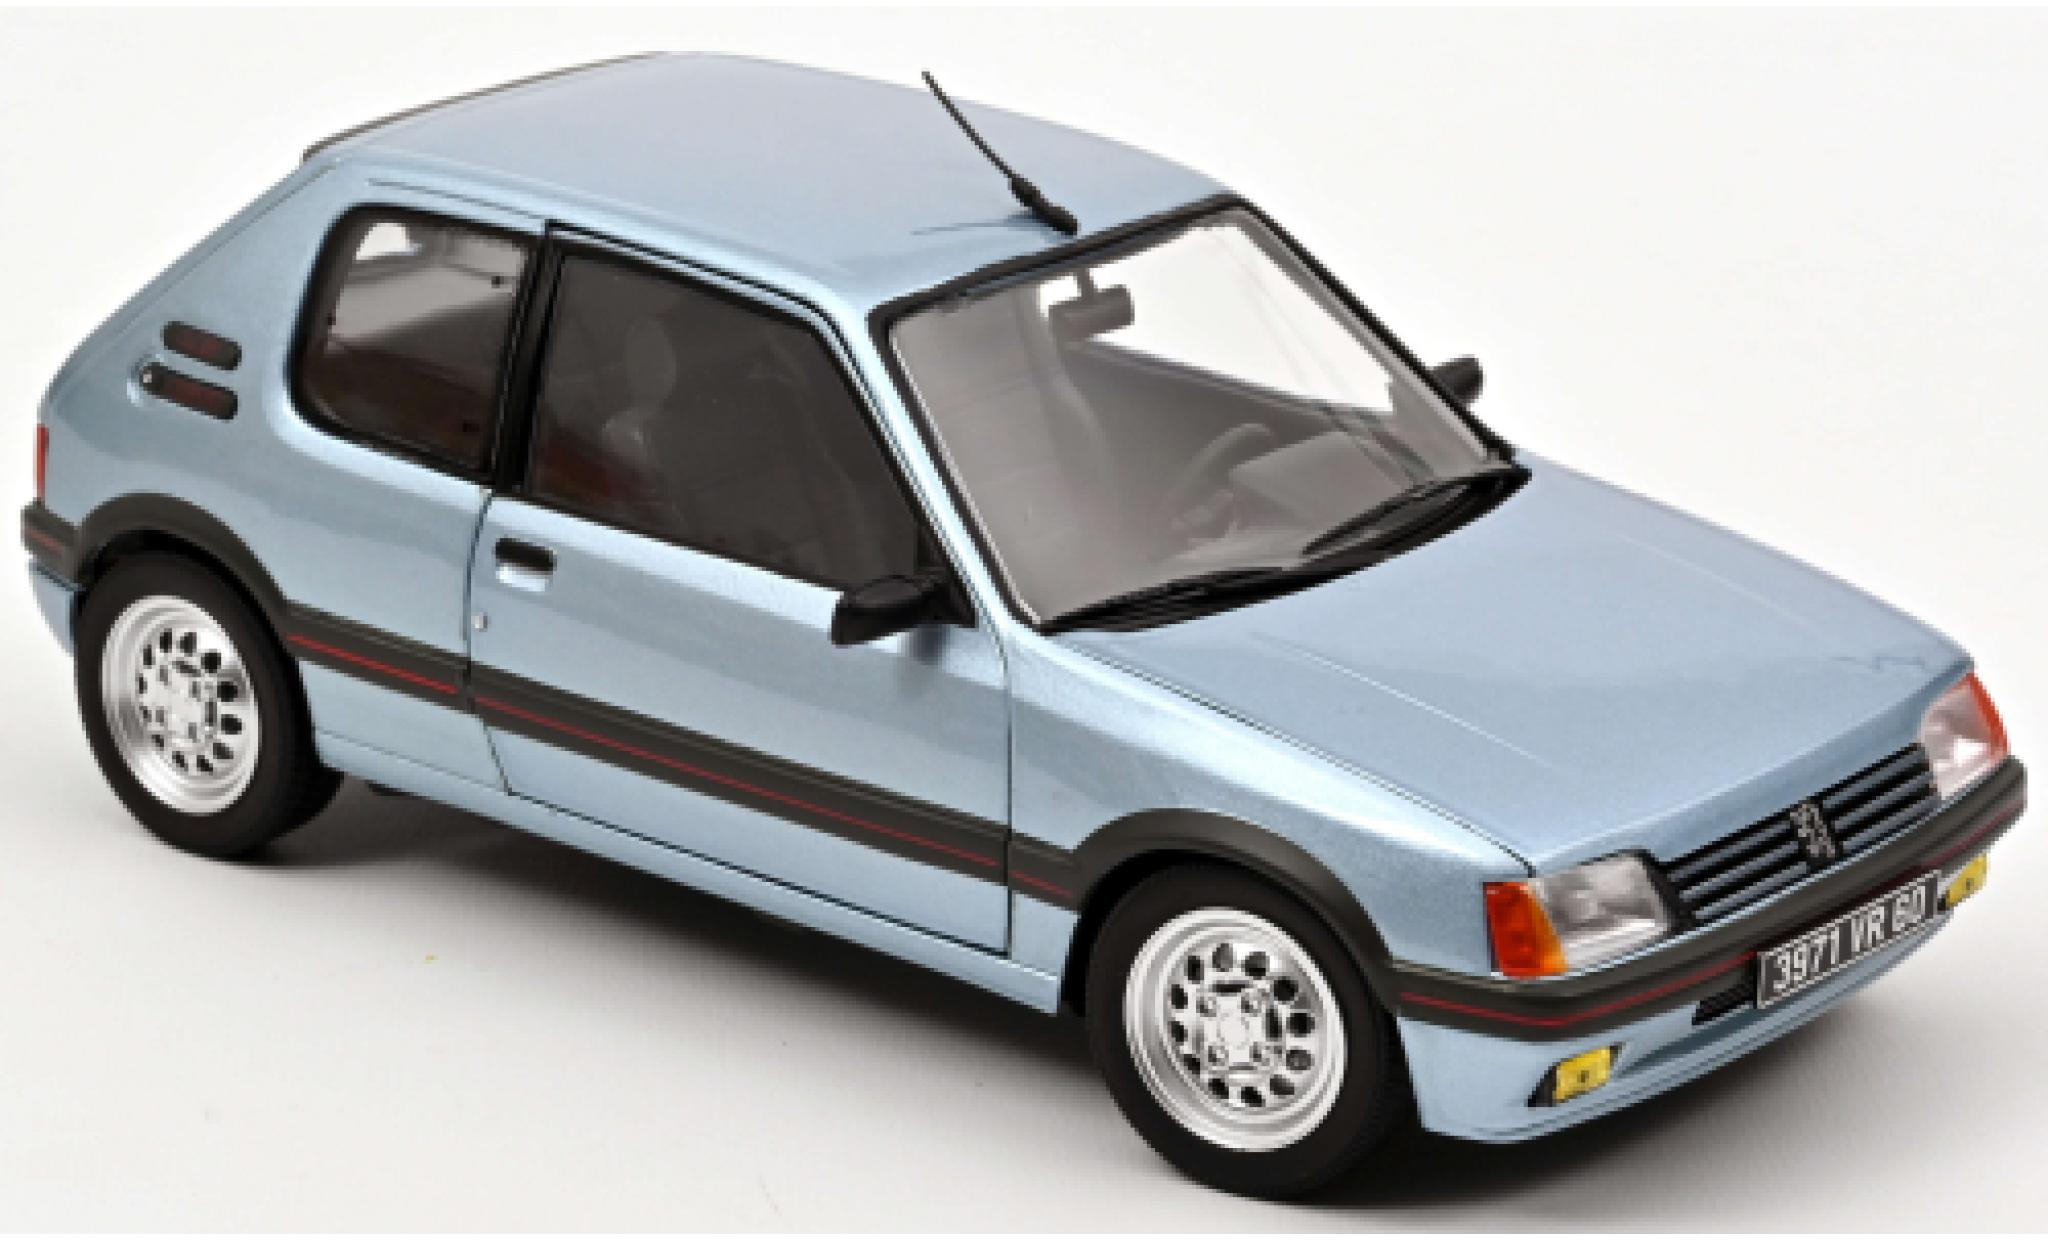 Peugeot 205 1/18 Norev Gti 1.6 bleue 1988